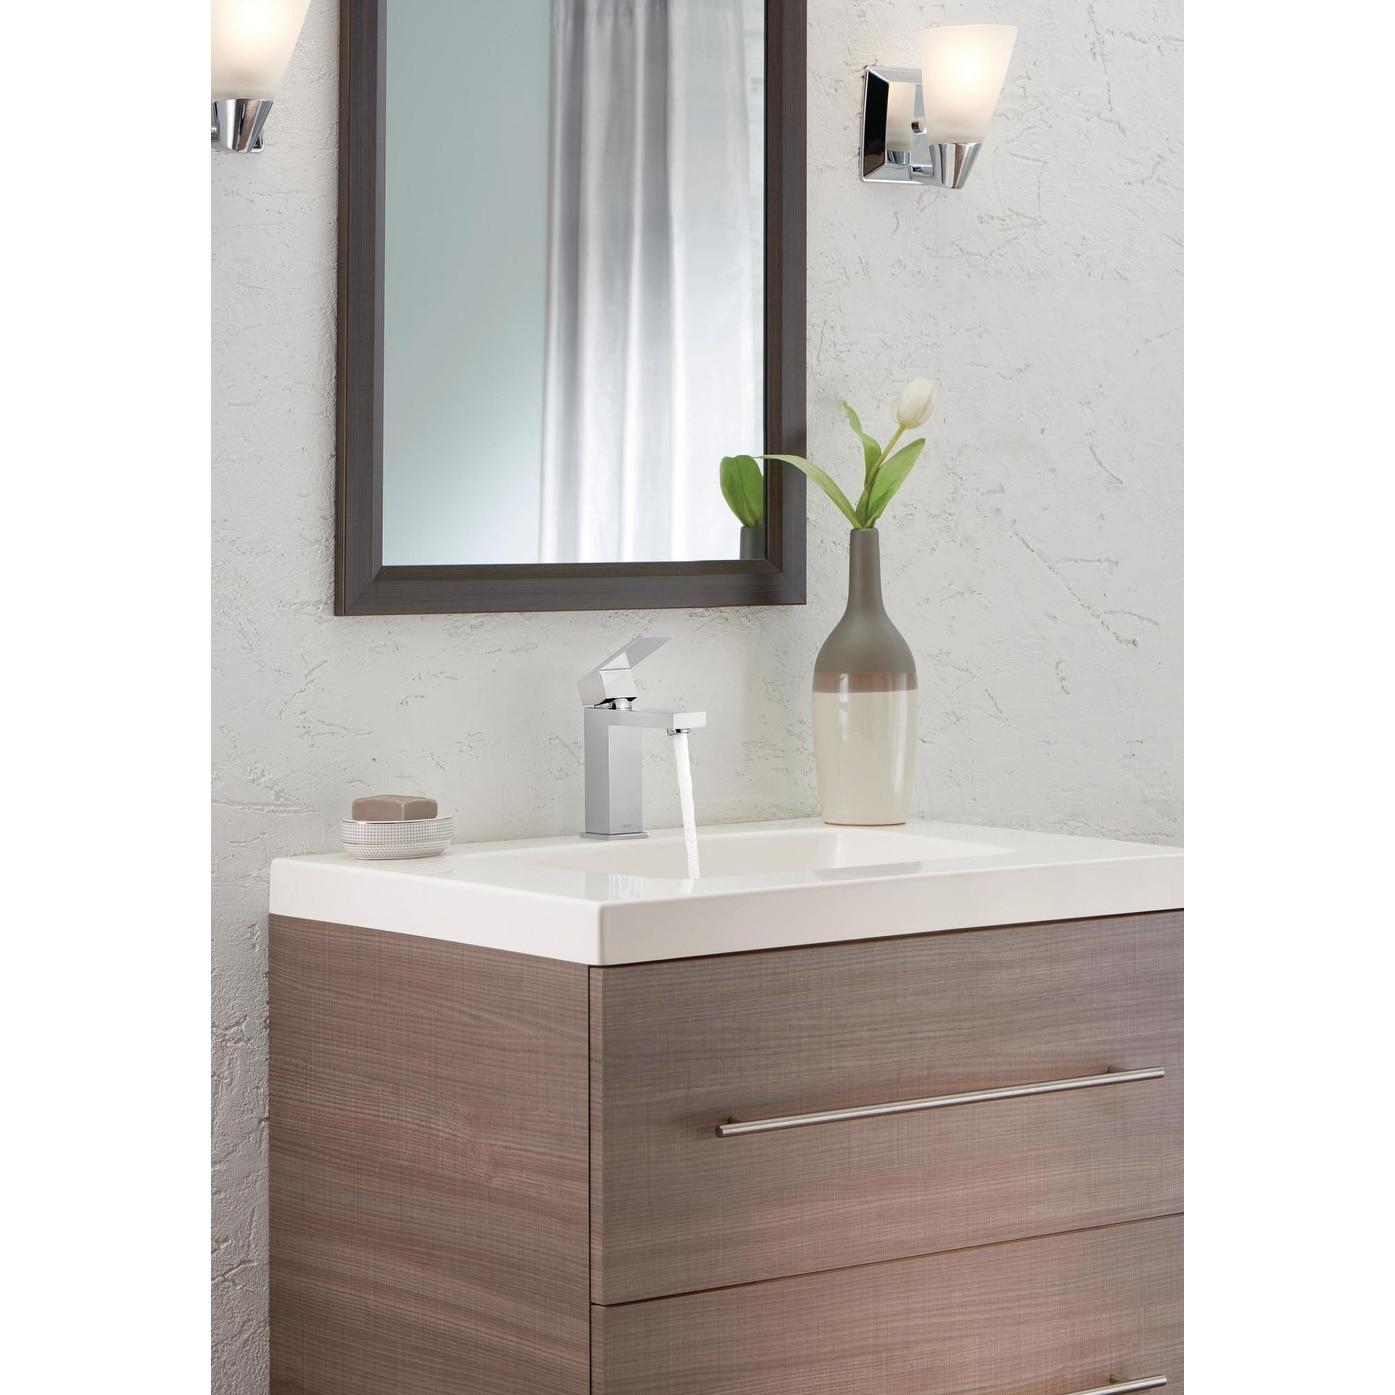 Shop Delta 567lf Pp Angular Modern Single Hole Bathroom Faucet With